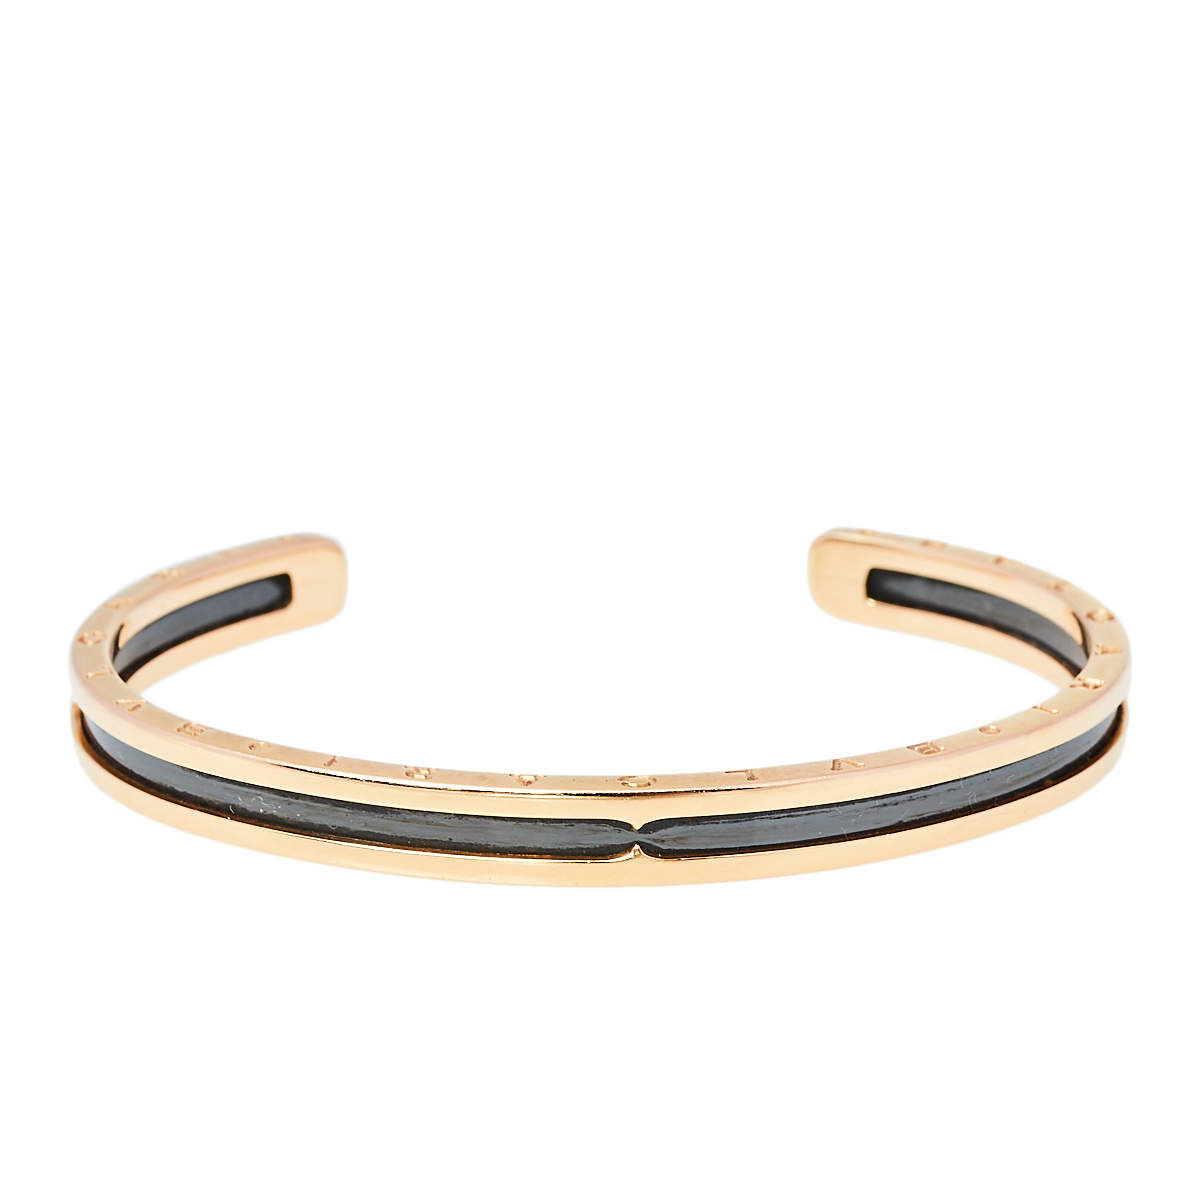 Bvlgari B.Zero1 18K Rose Gold Carbon Coated Steel Open Cuff Bracelet